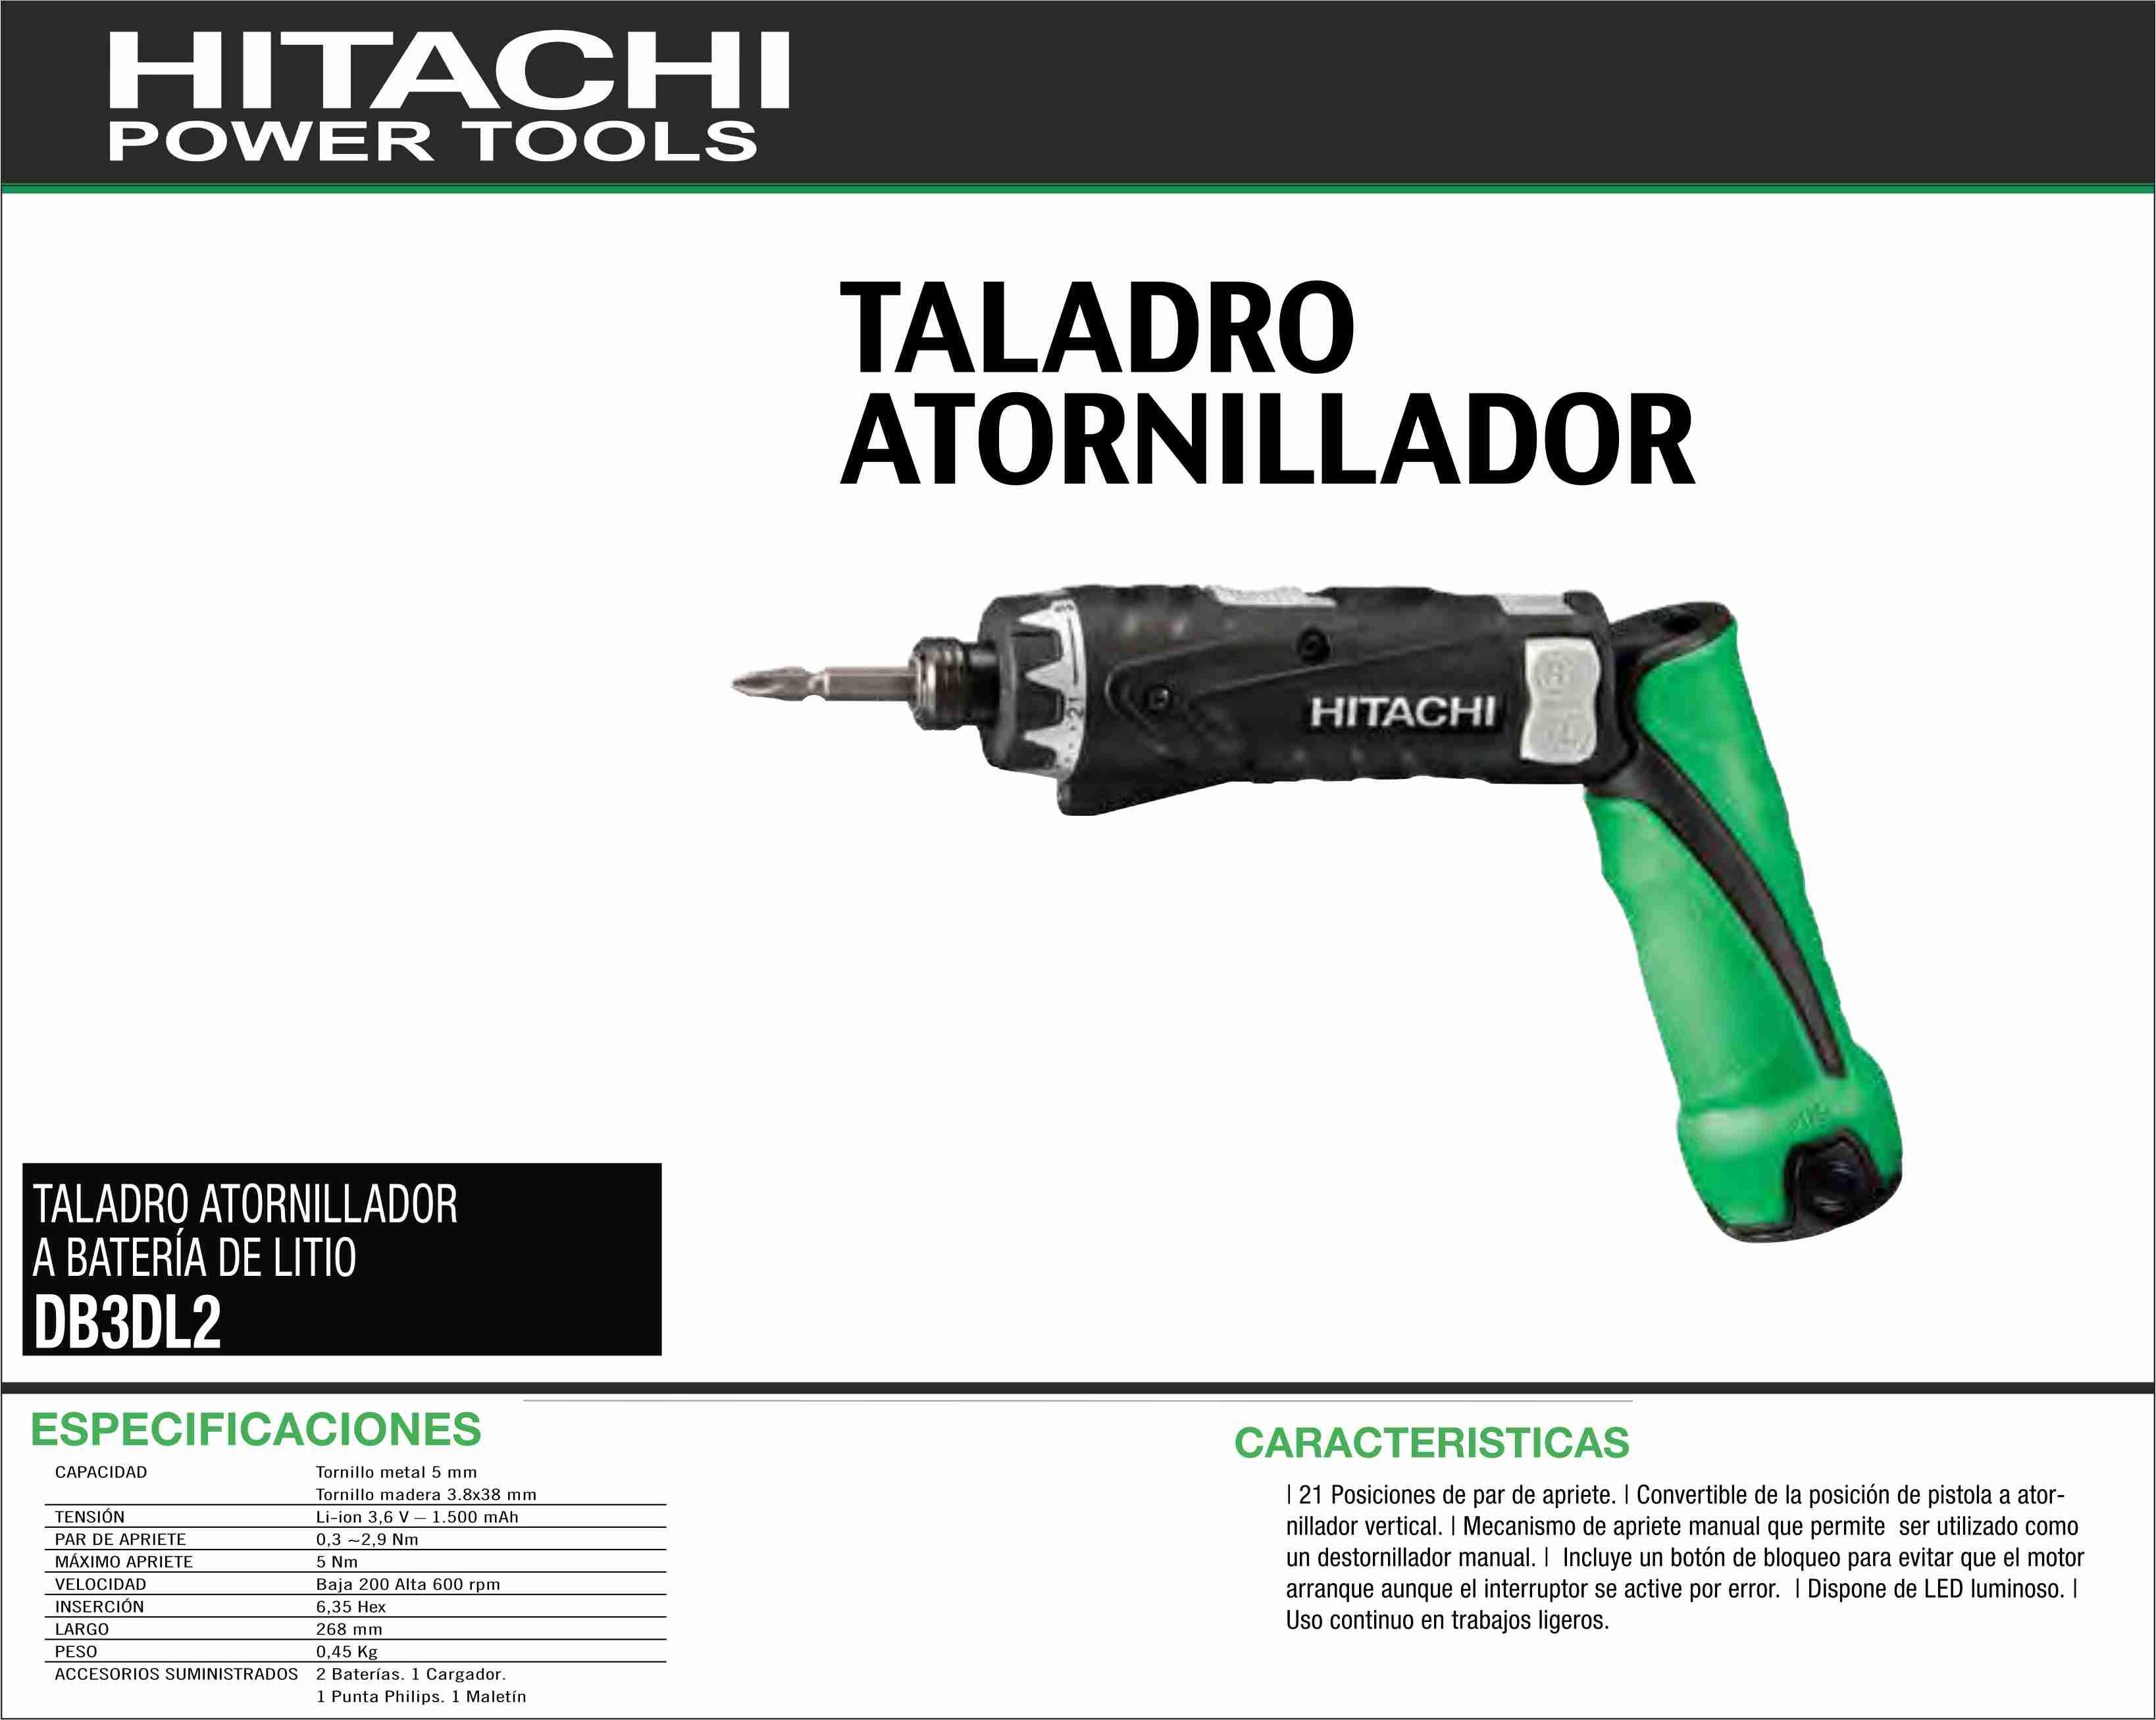 Hitachi taladro atornillador a bateria de litio db3dl2 - Ofertas de taladros de bateria ...